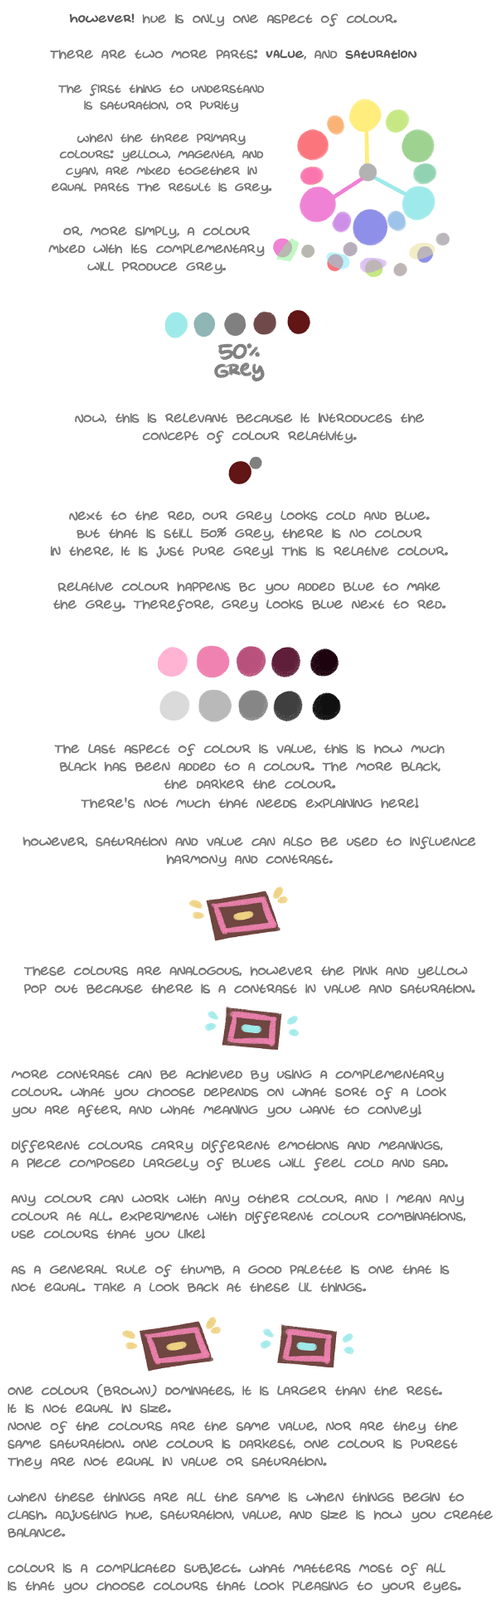 Using Colour - Saturation, Value, Balance by CaptainHarrie